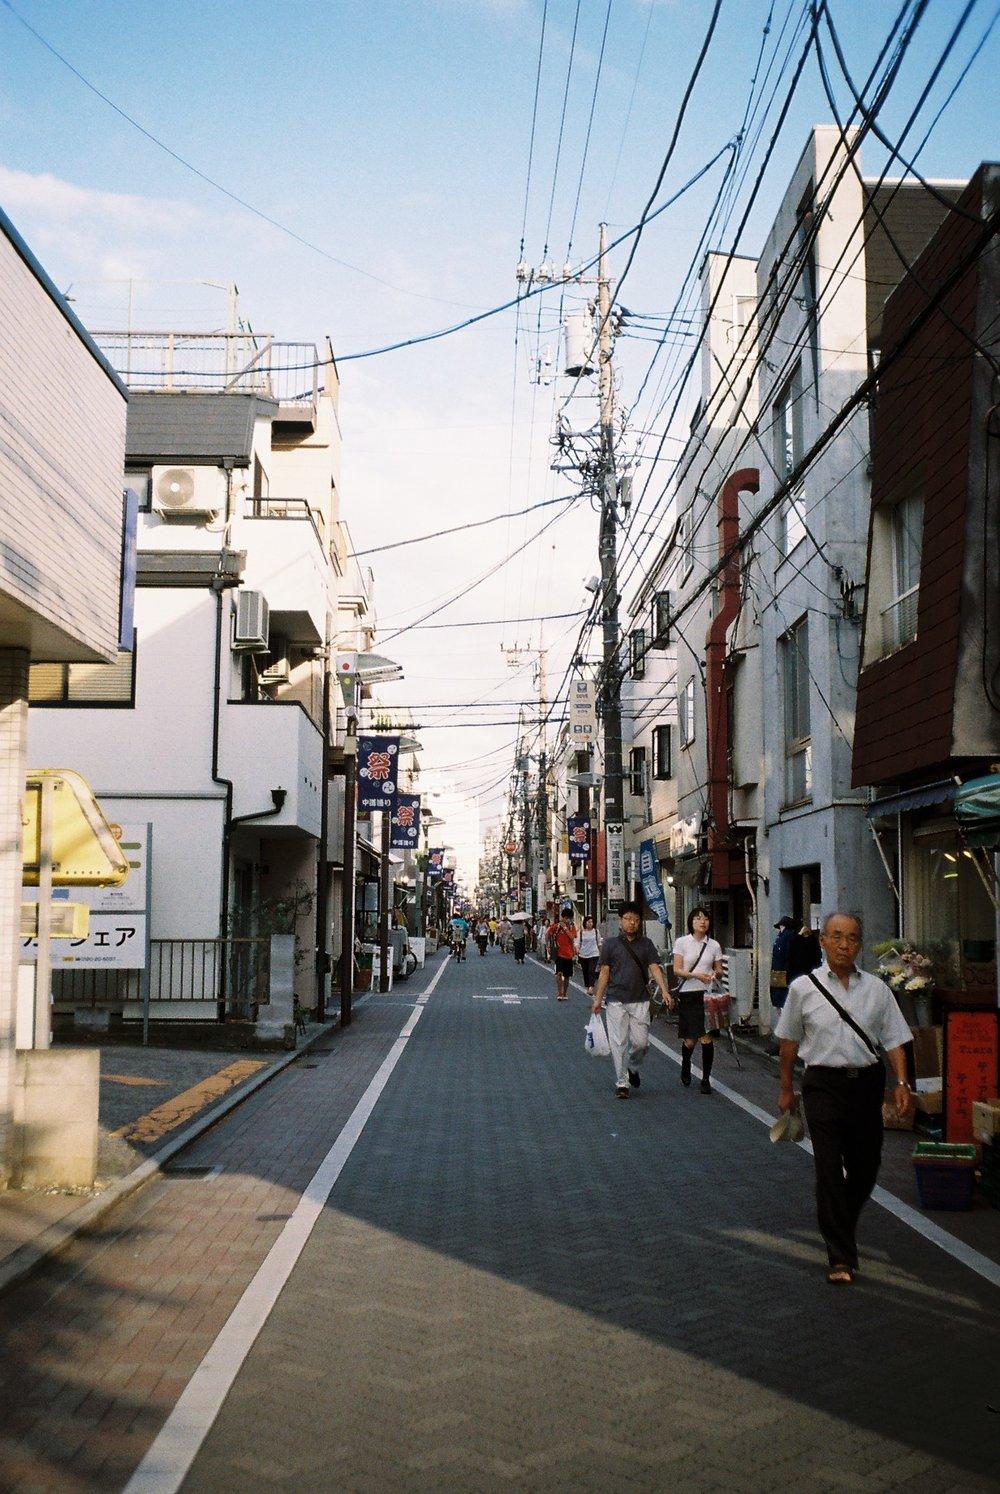 07-JAPON-argentic-Tokyo-septembre-2016-0016.JPG